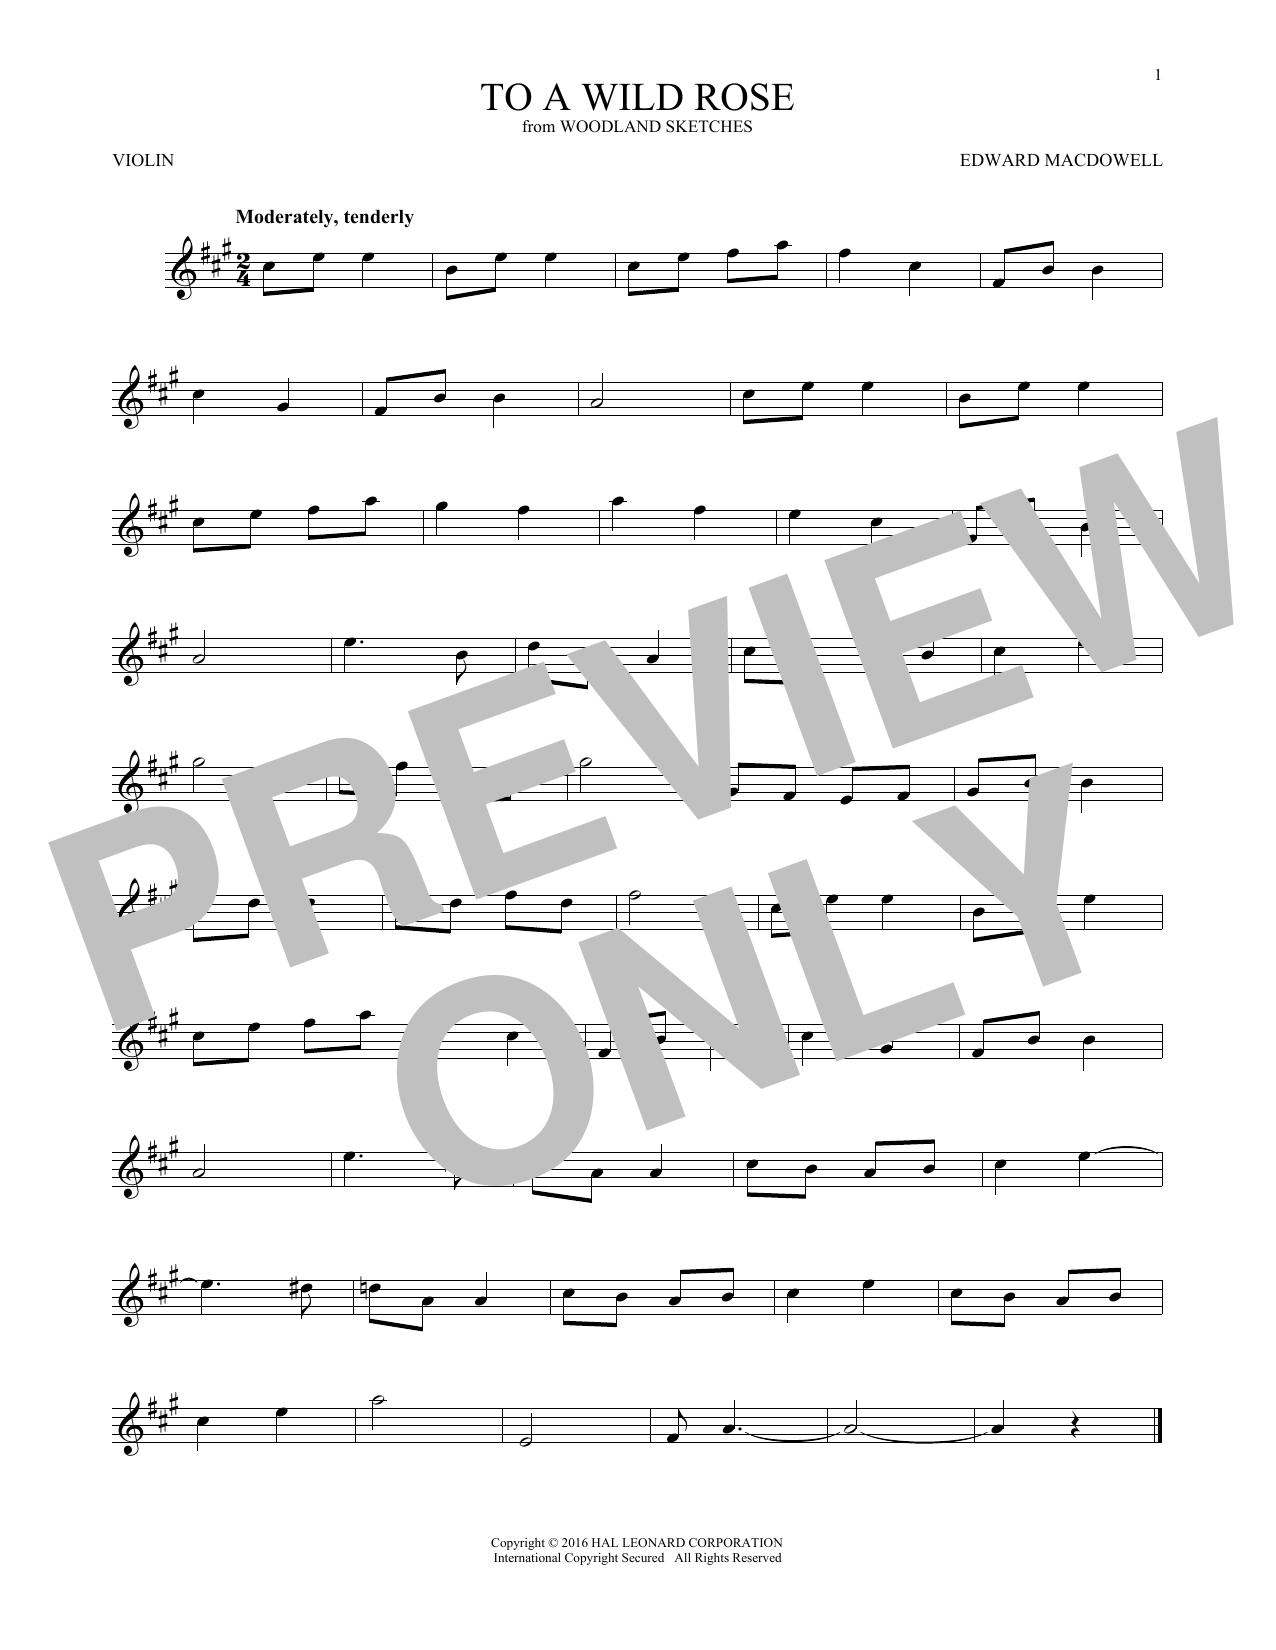 To A Wild Rose, Op. 51, No. 1 (Violin Solo)